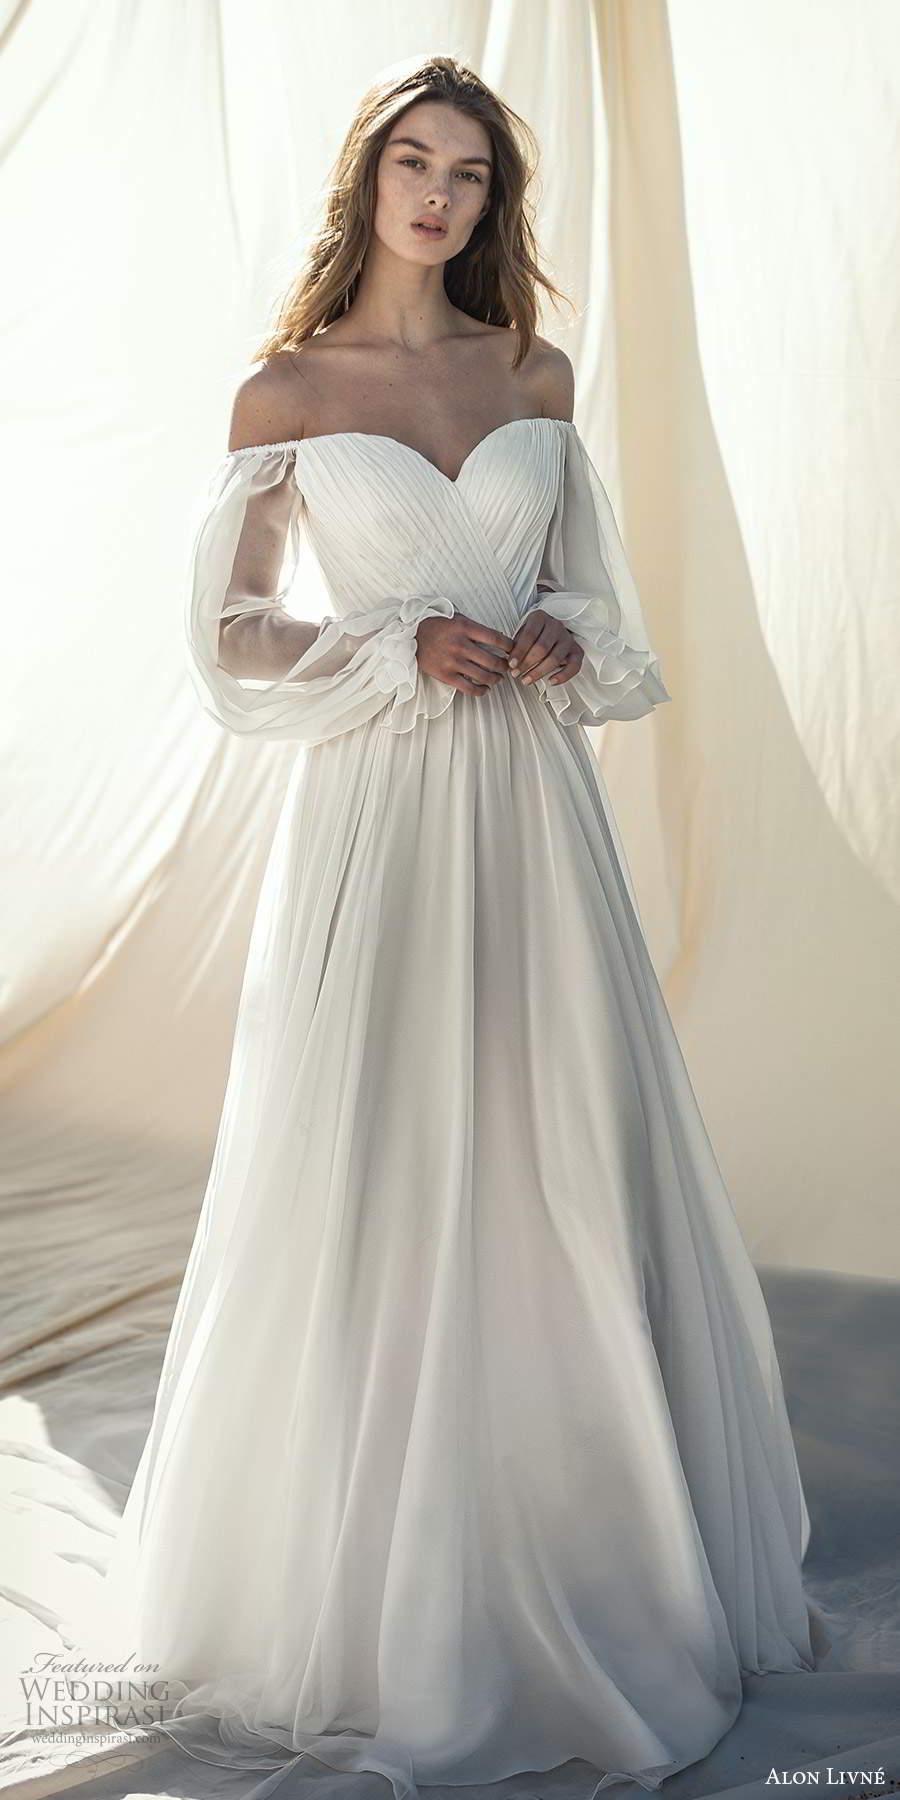 alon livne fall 2020 bridal sheer bishop sleeves off shoulder sweetheart neckline pleated bodice a line ball gown wedding dress v back chapel train (2) mv